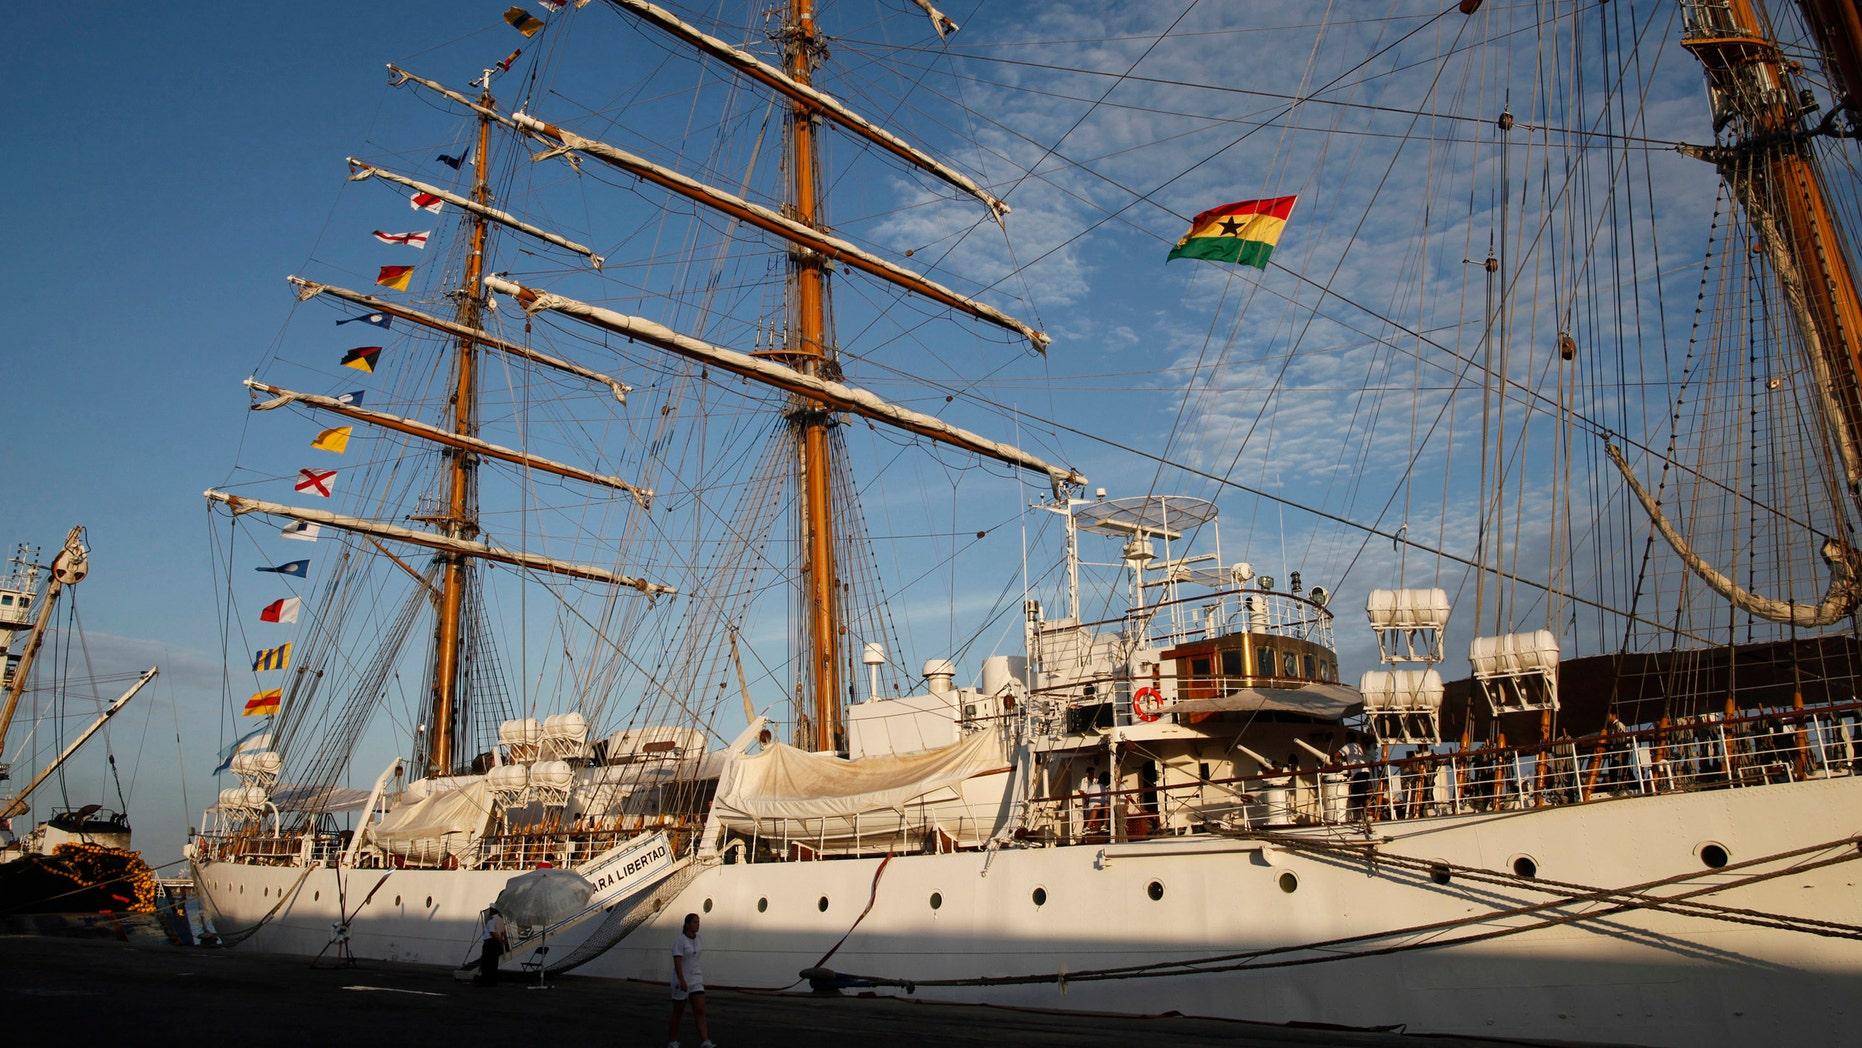 The three-masted ARA Libertad, a symbol of Argentina's navy, sits docked at the port in Tema, outside Accra, Ghana, Saturday, Oct. 20, 2012. (AP Photo/Gabriela Barnuevo)